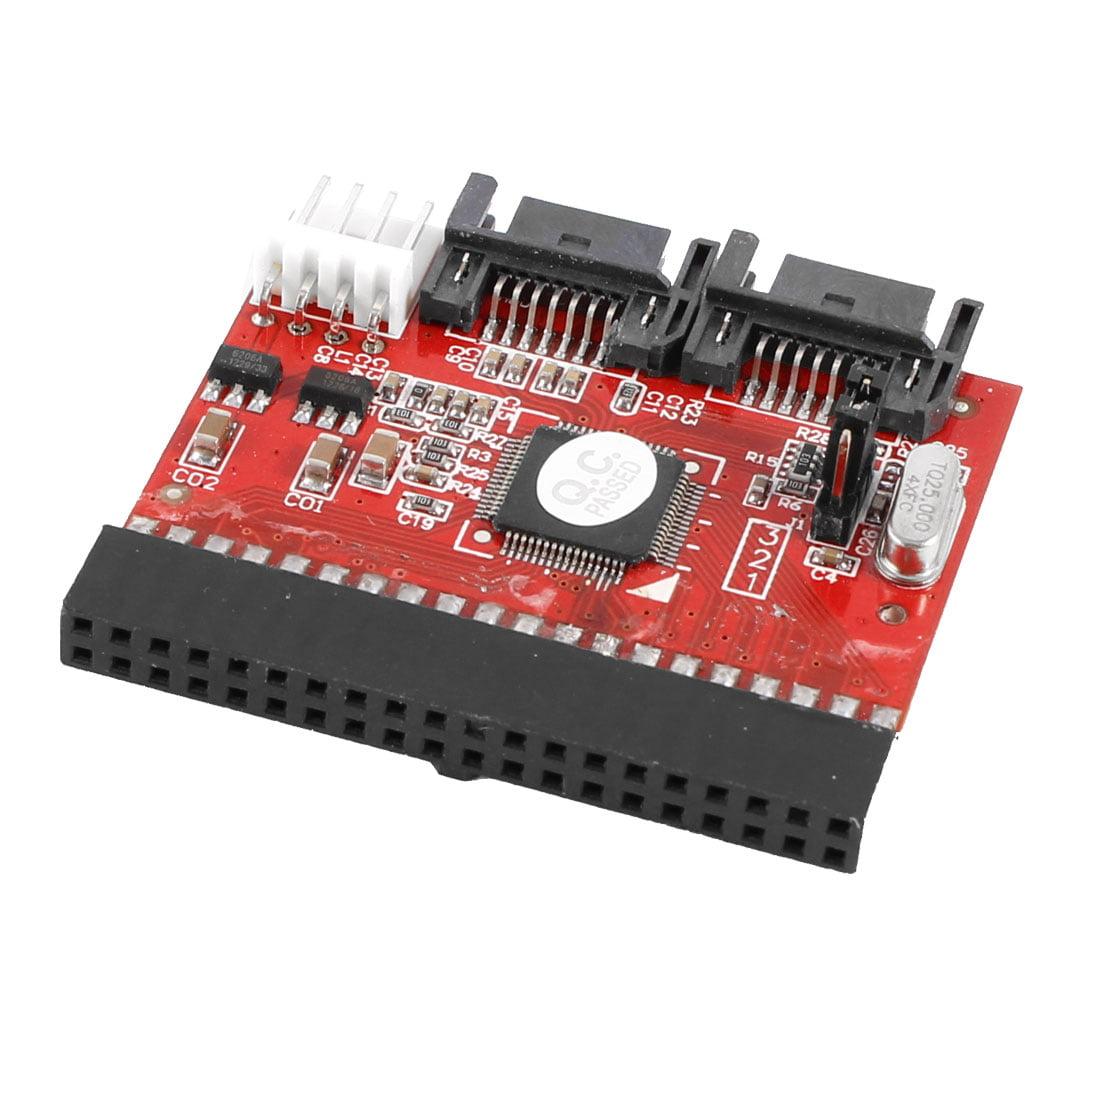 Unique Bargains 2 Way 40 Pin IDE to SATA or SATA to IDE C...